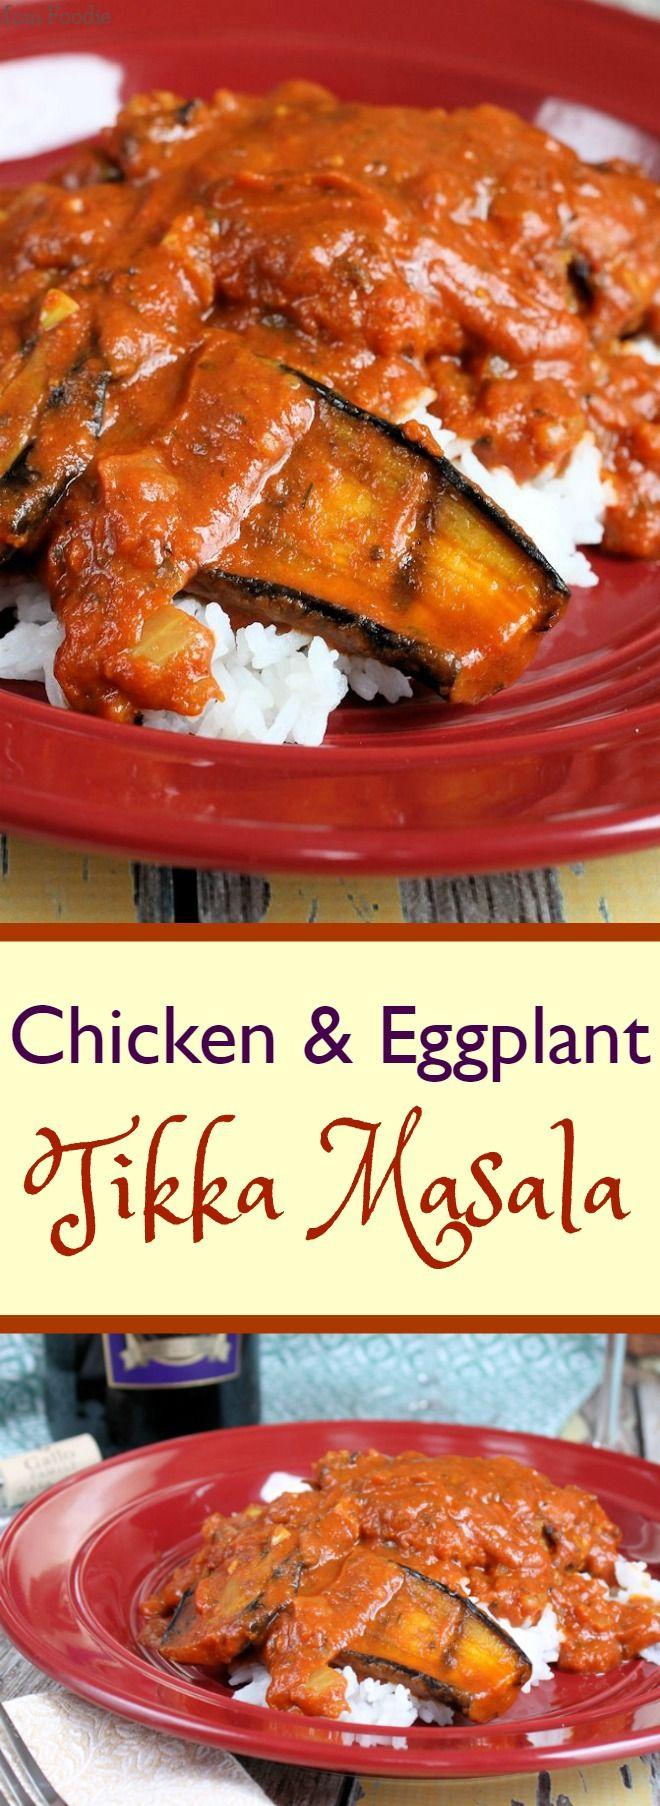 Chicken & Eggplant Tikka Masala